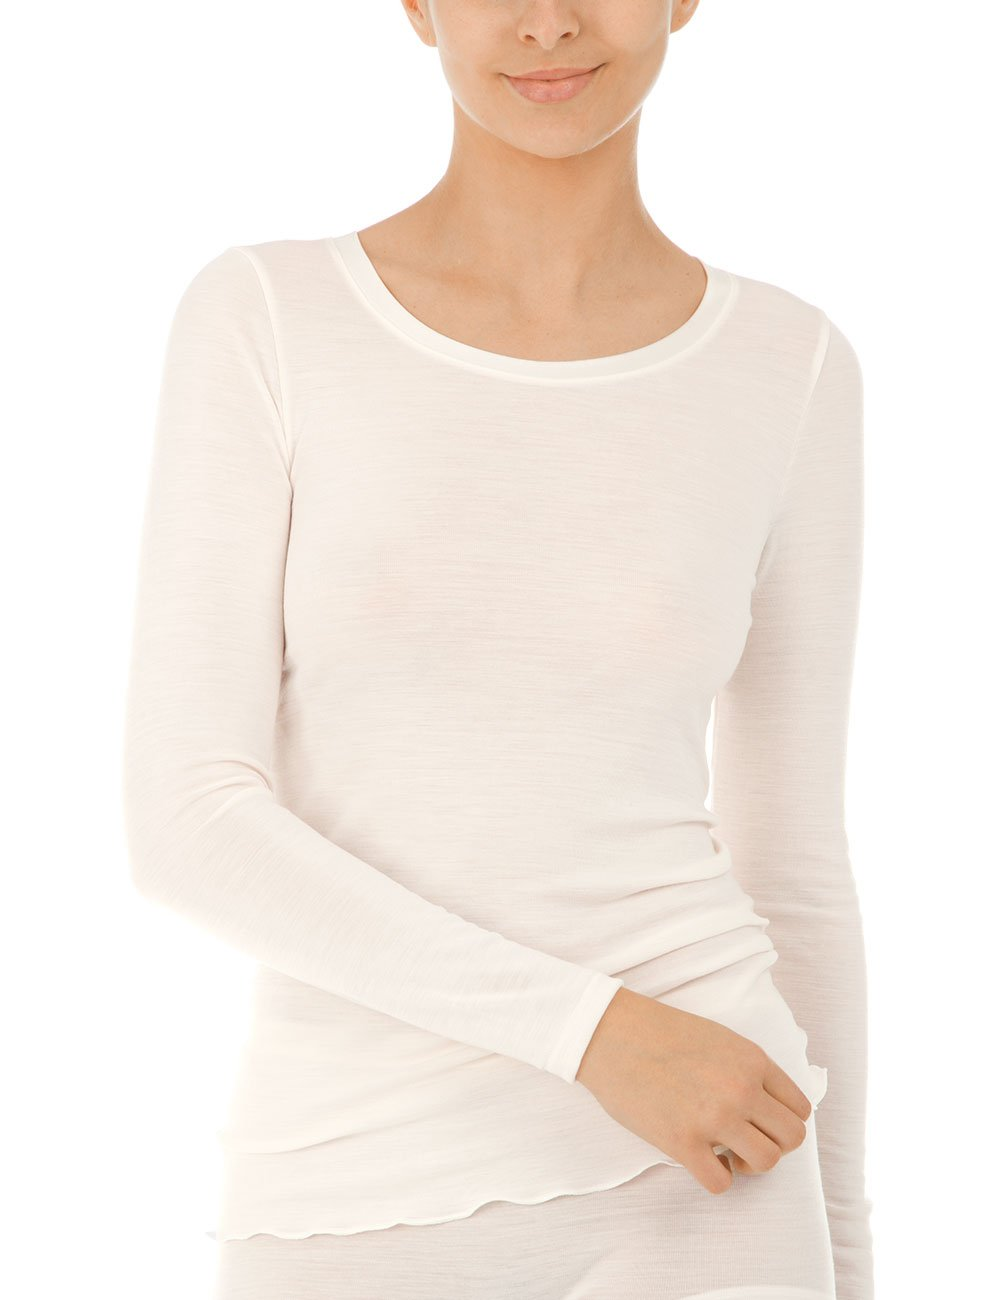 Calida Damen Unterhemd True Confidence Top Langarm: Amazon.de: Bekleidung